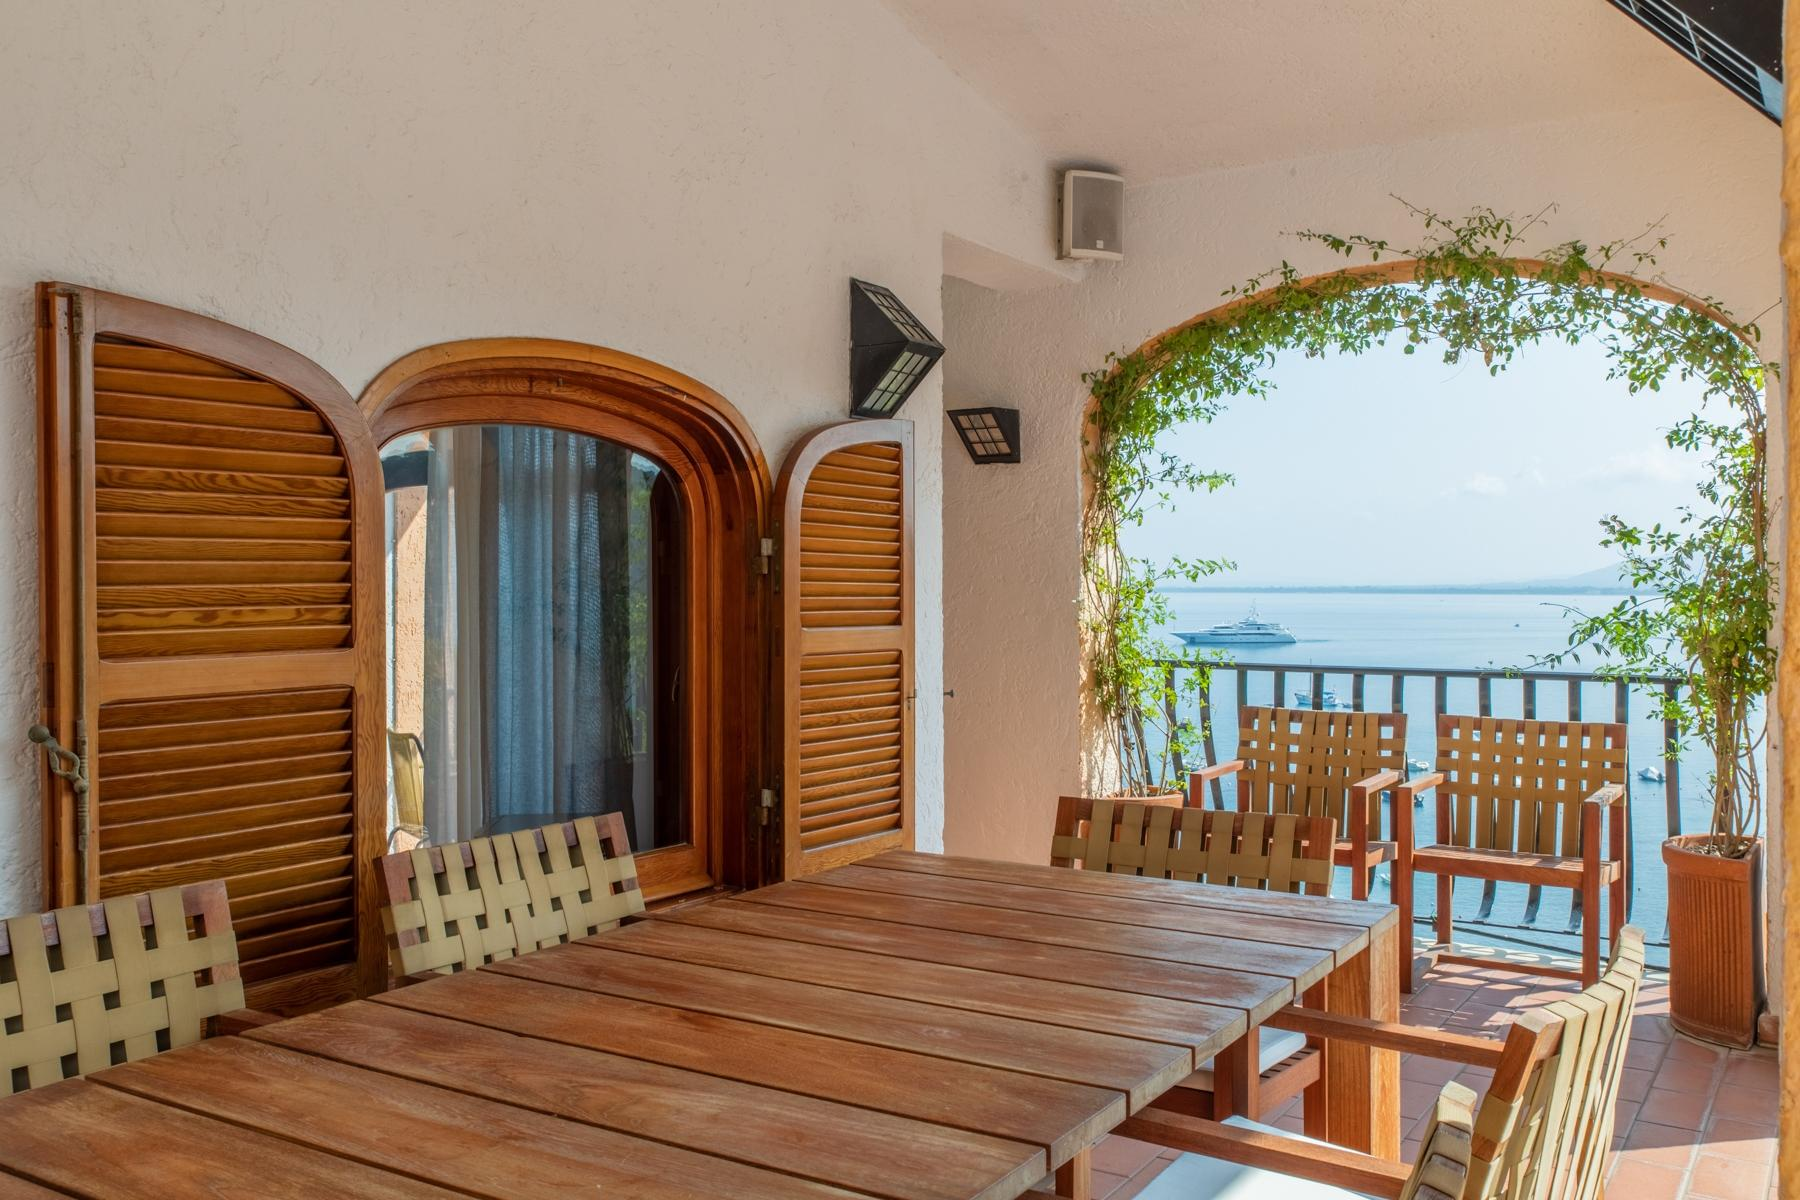 Superbe villa avec piscine au bord de la  mer - 3